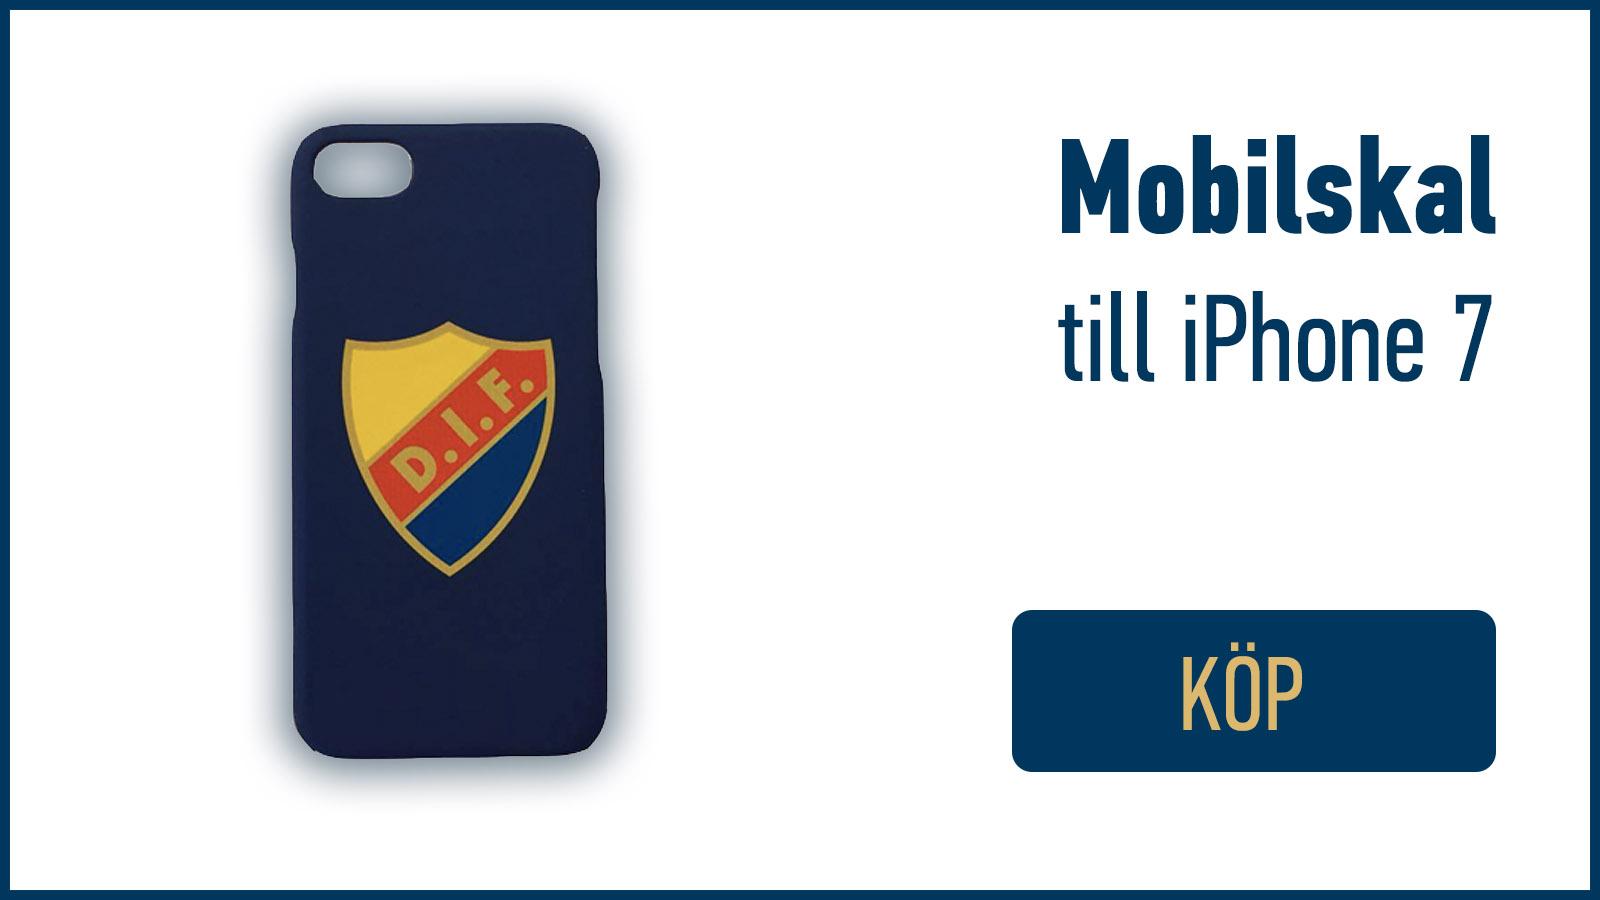 Mobilskal iphone 7